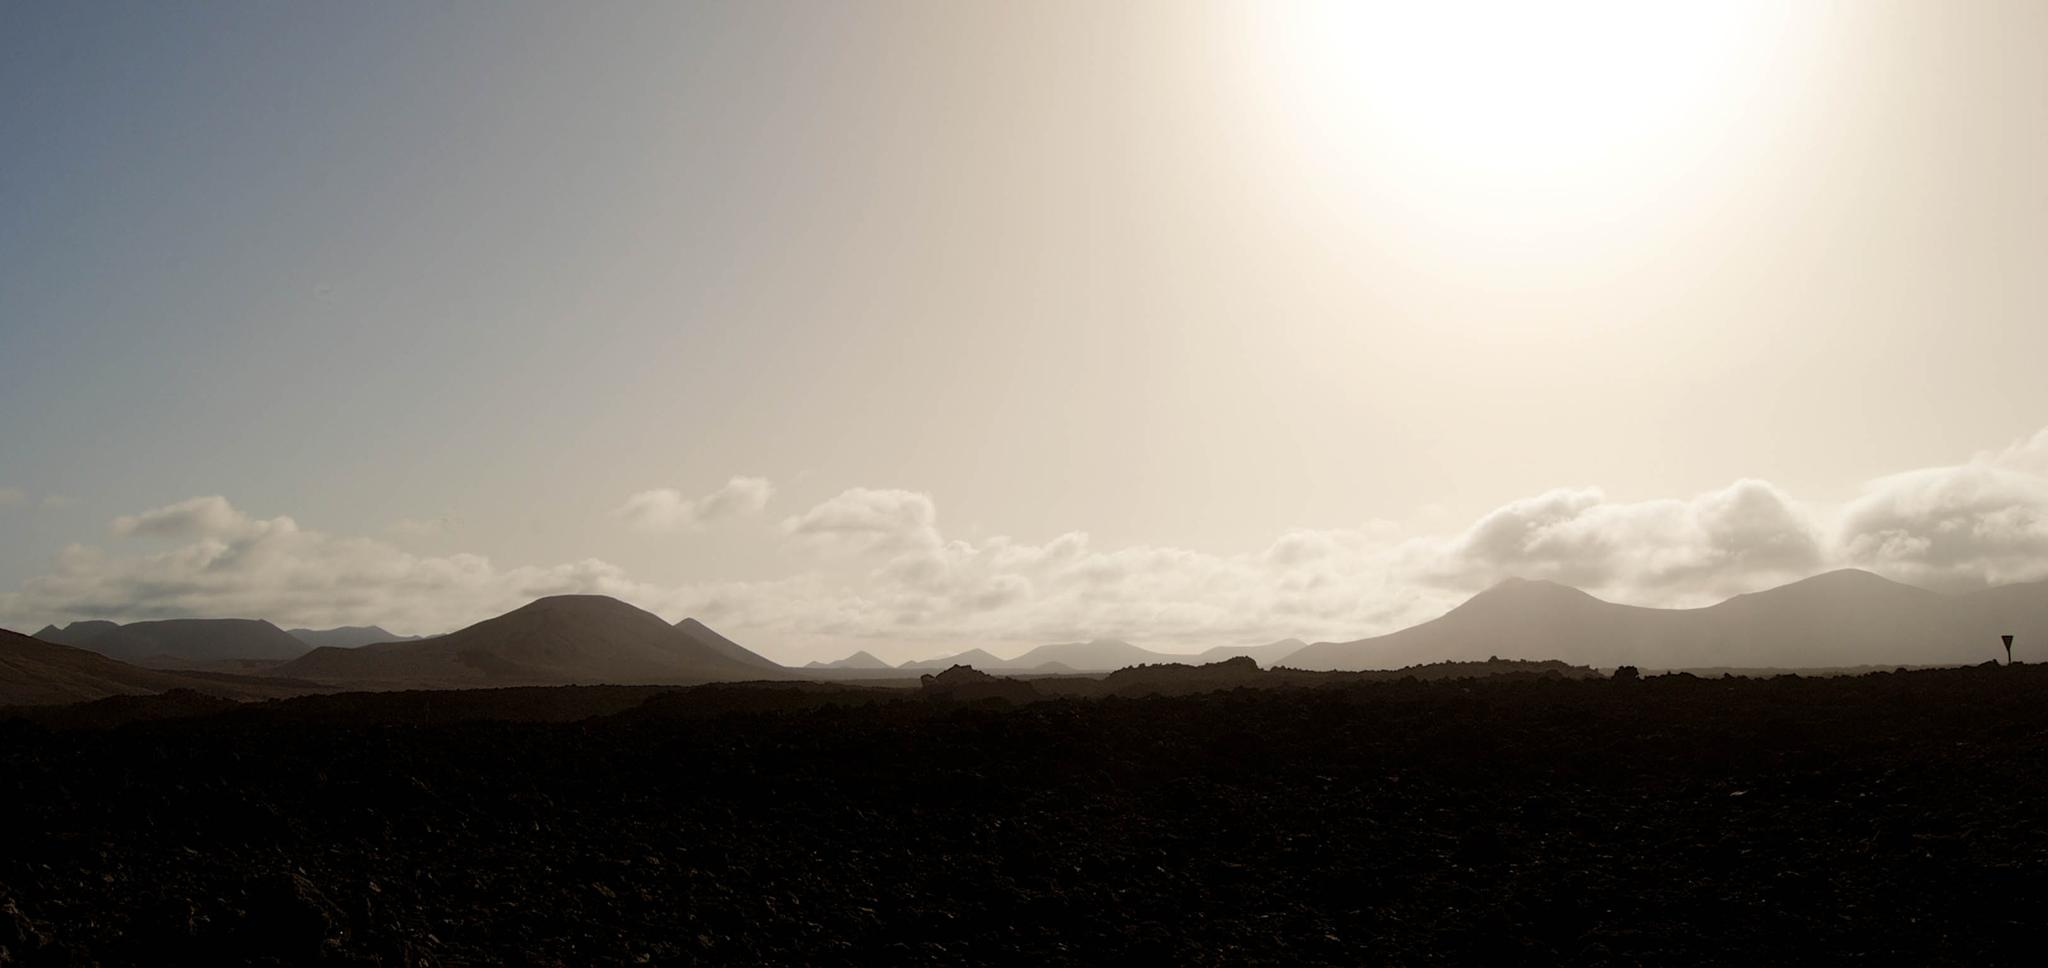 LANZAROTE - BURNED LAND by DavidRoldan